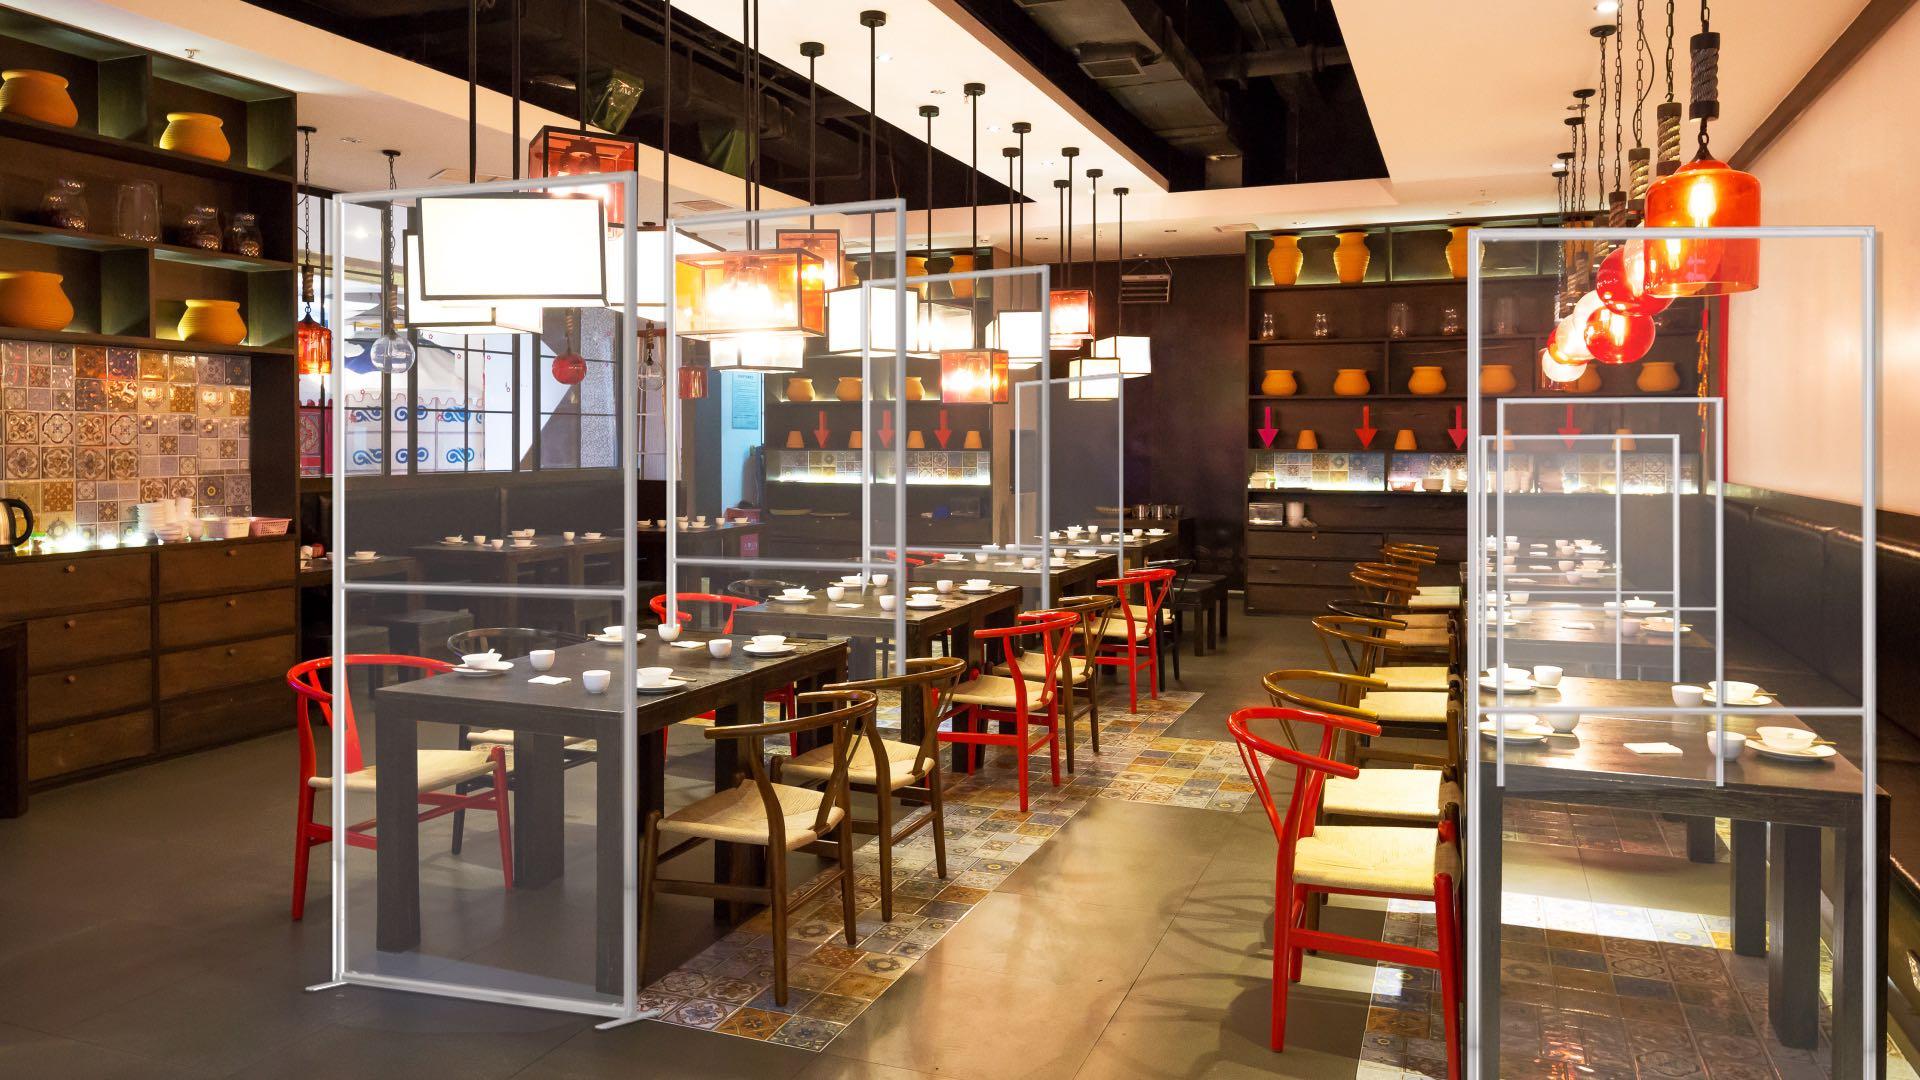 Q-fram-panneau-protection-isolation-covid-19-coronavirus-réception-restaurant